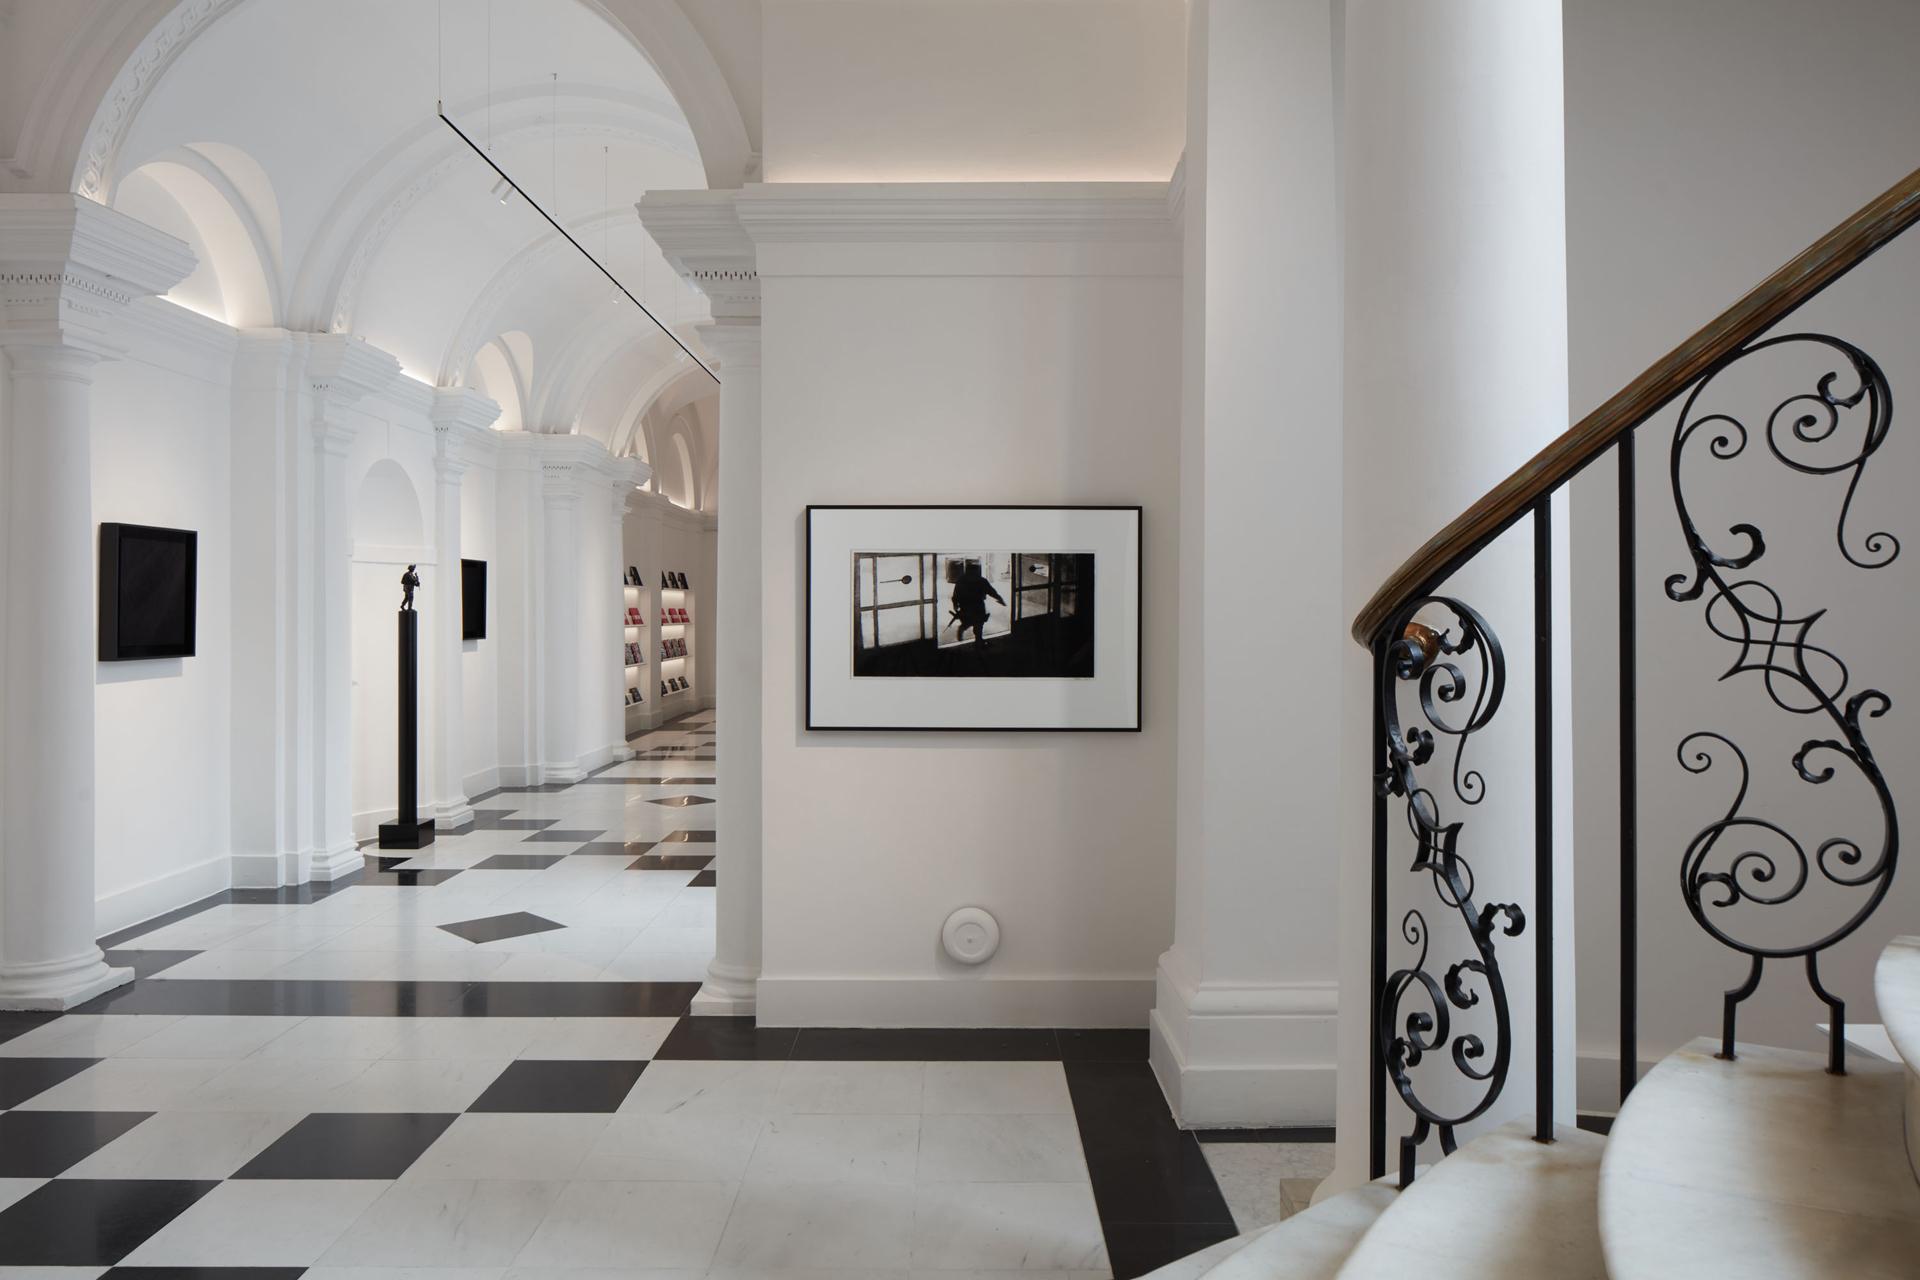 PJC-Light-Studio-Galerie-Thaddaeus-Ropac-Robert-Longo-01W.jpg